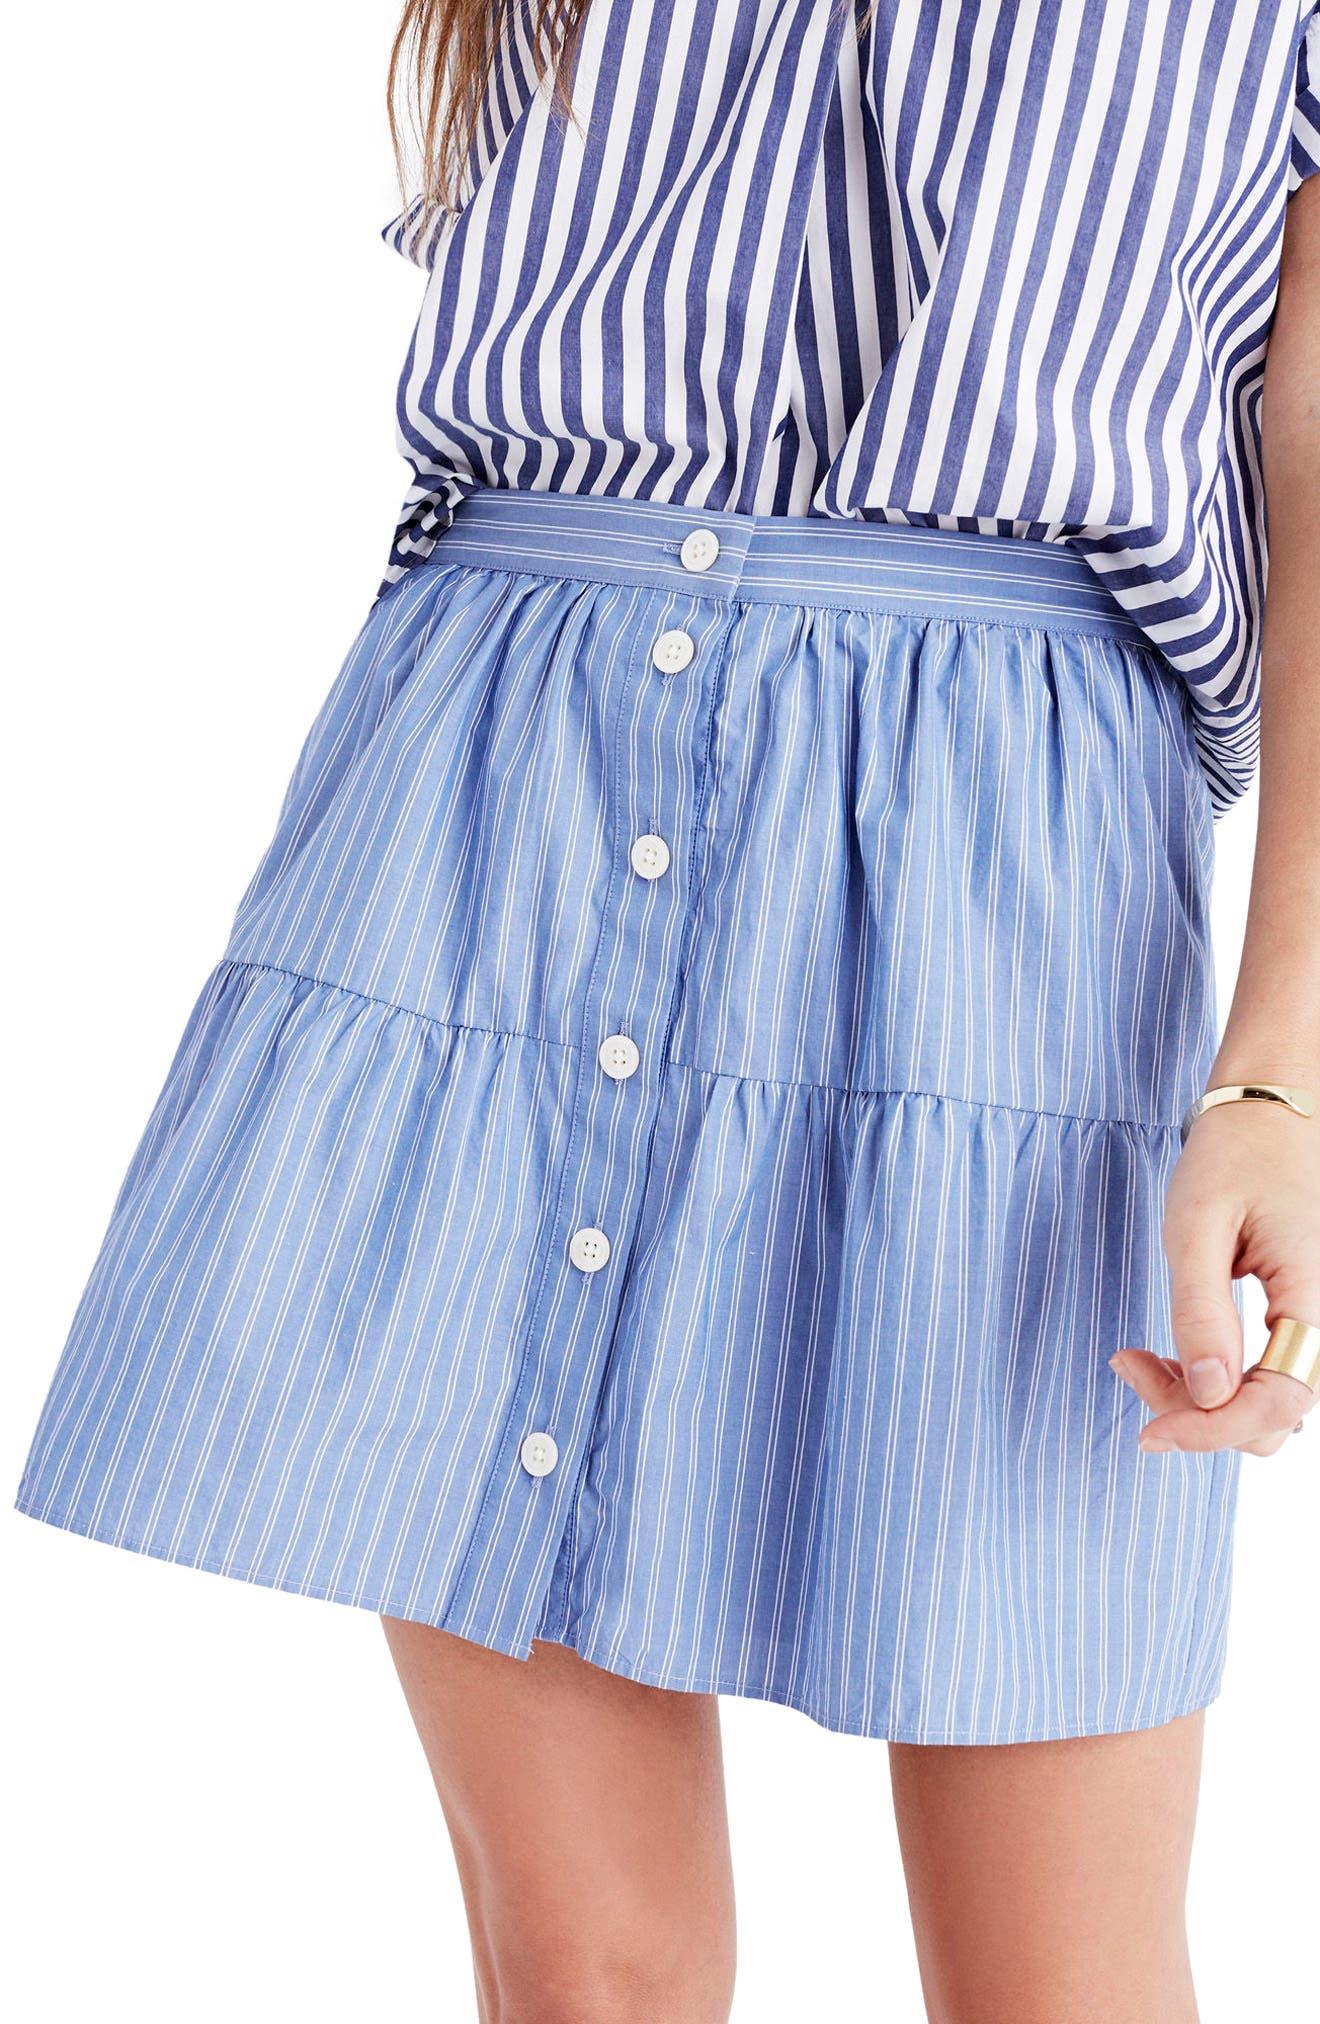 Alternate Image 1 Selected - Madewell Bistro Stripe Skirt